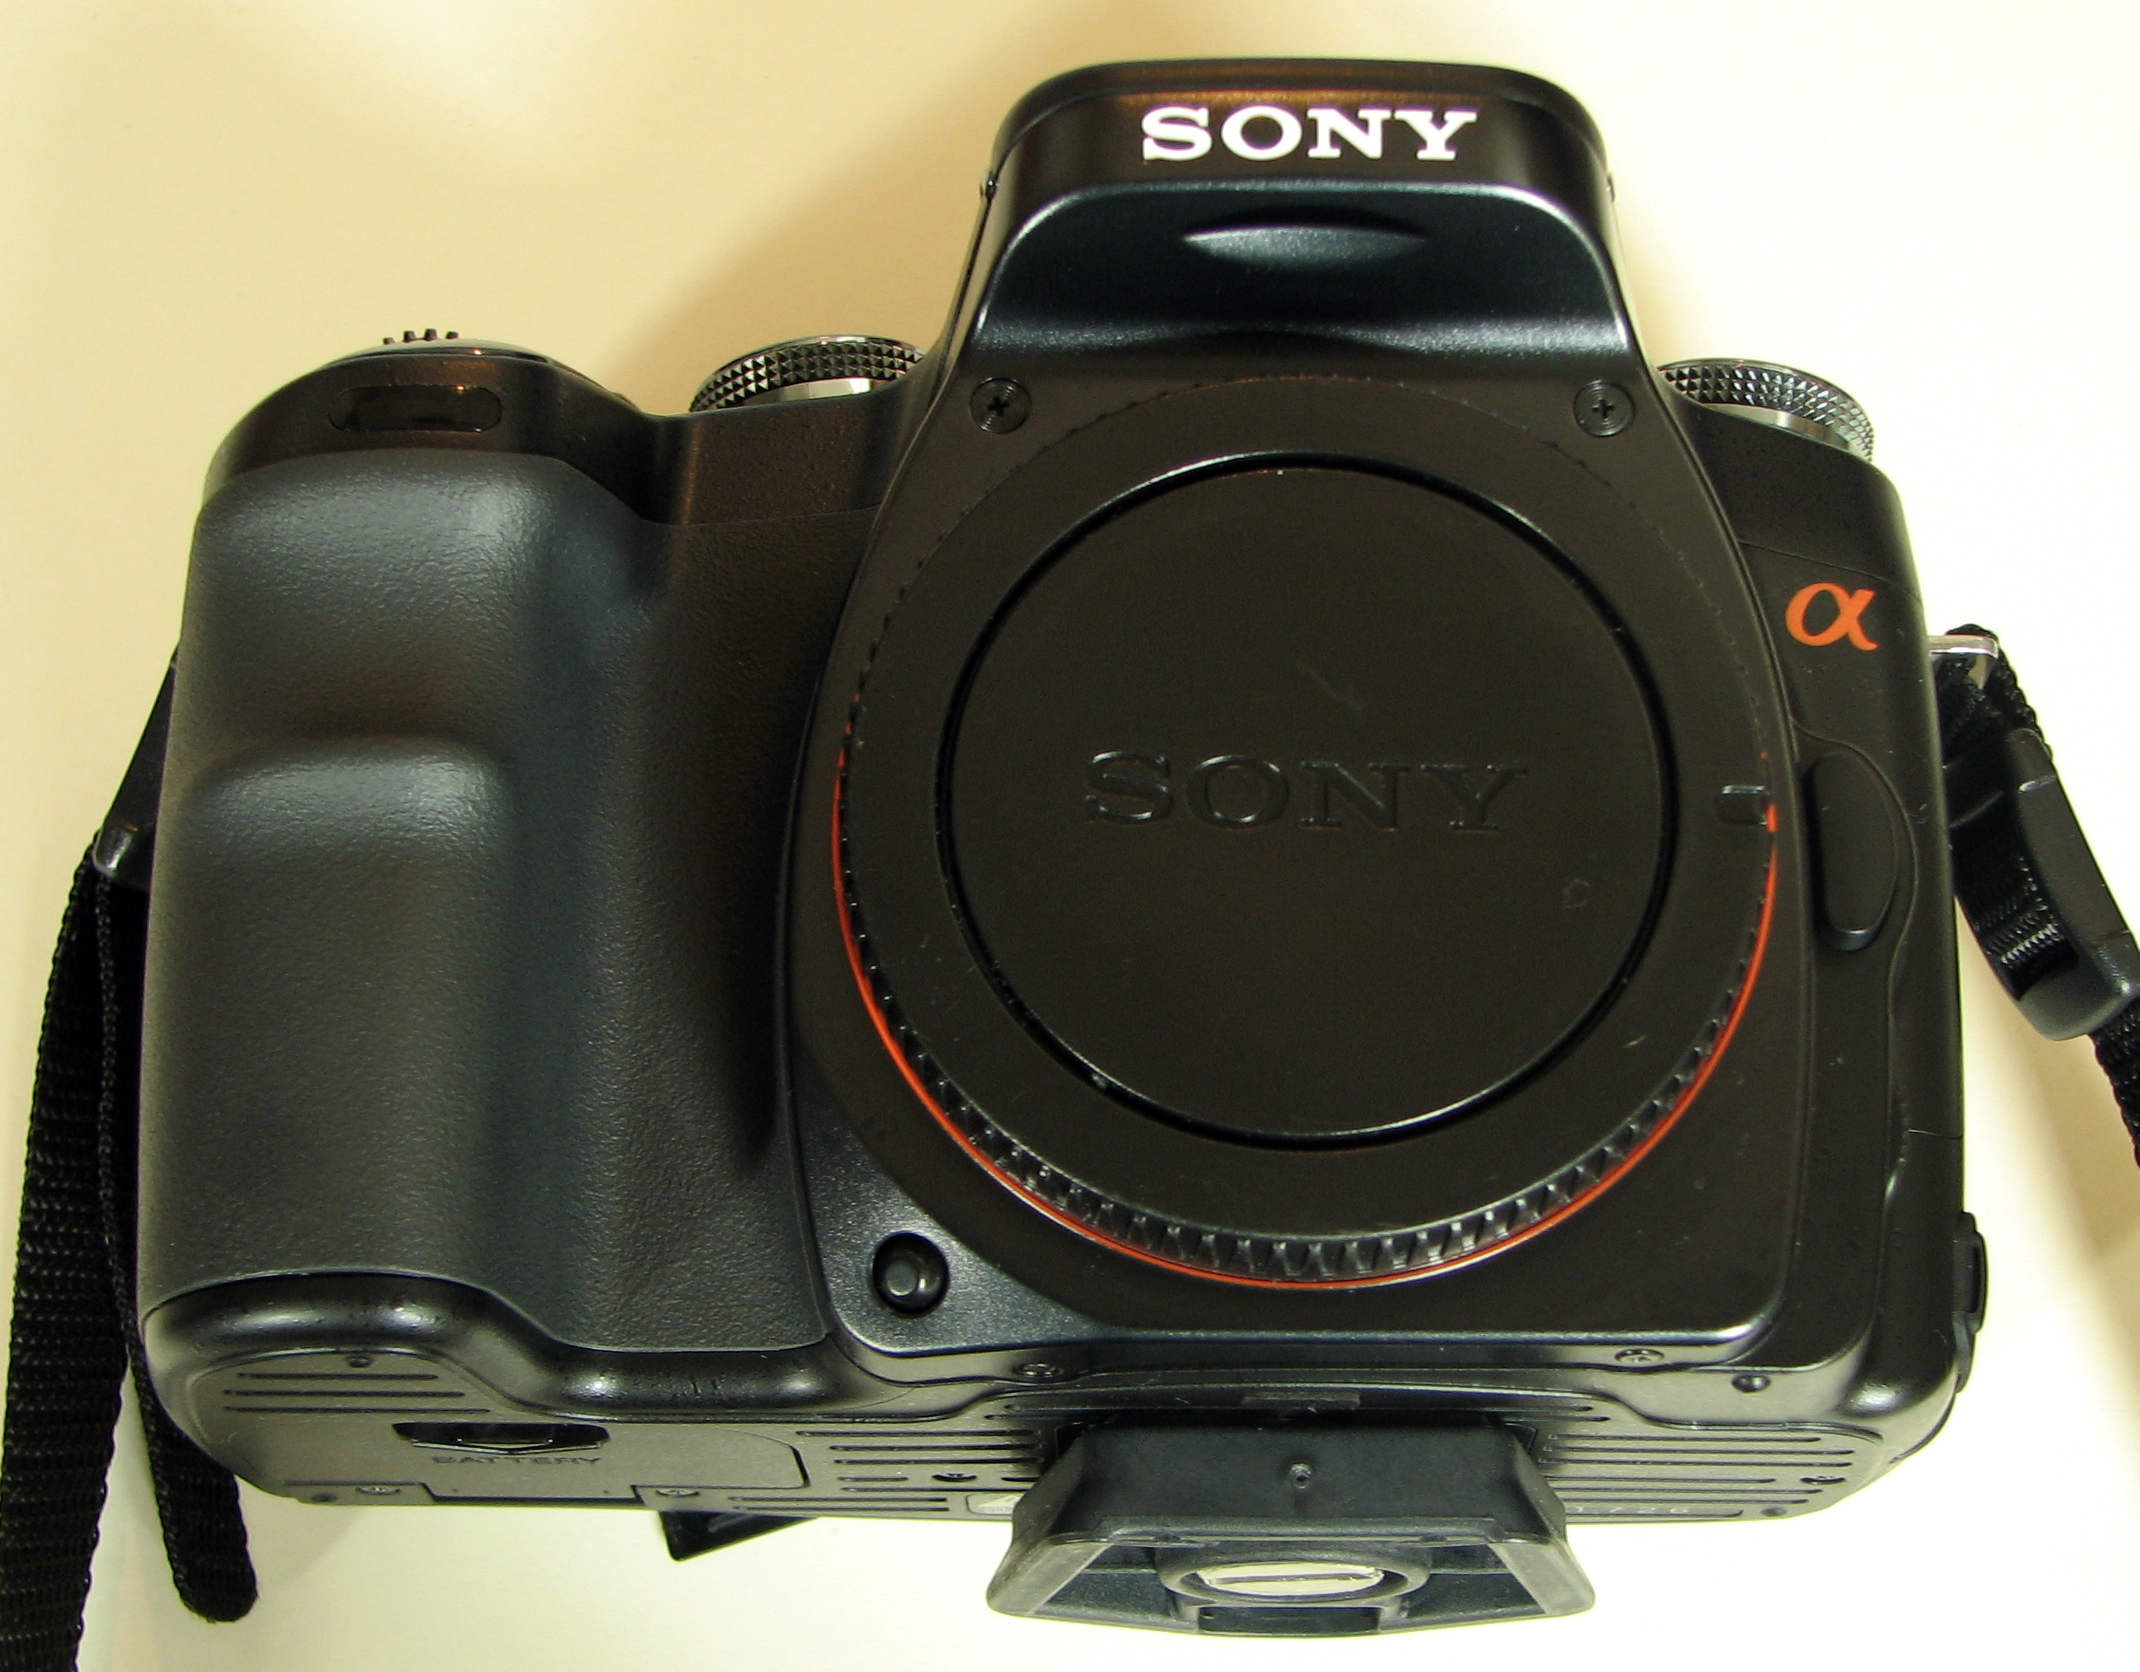 Camera Sony A100 Dslr Camera filesony alpha dslr a100 jpg wikimedia commons jpg